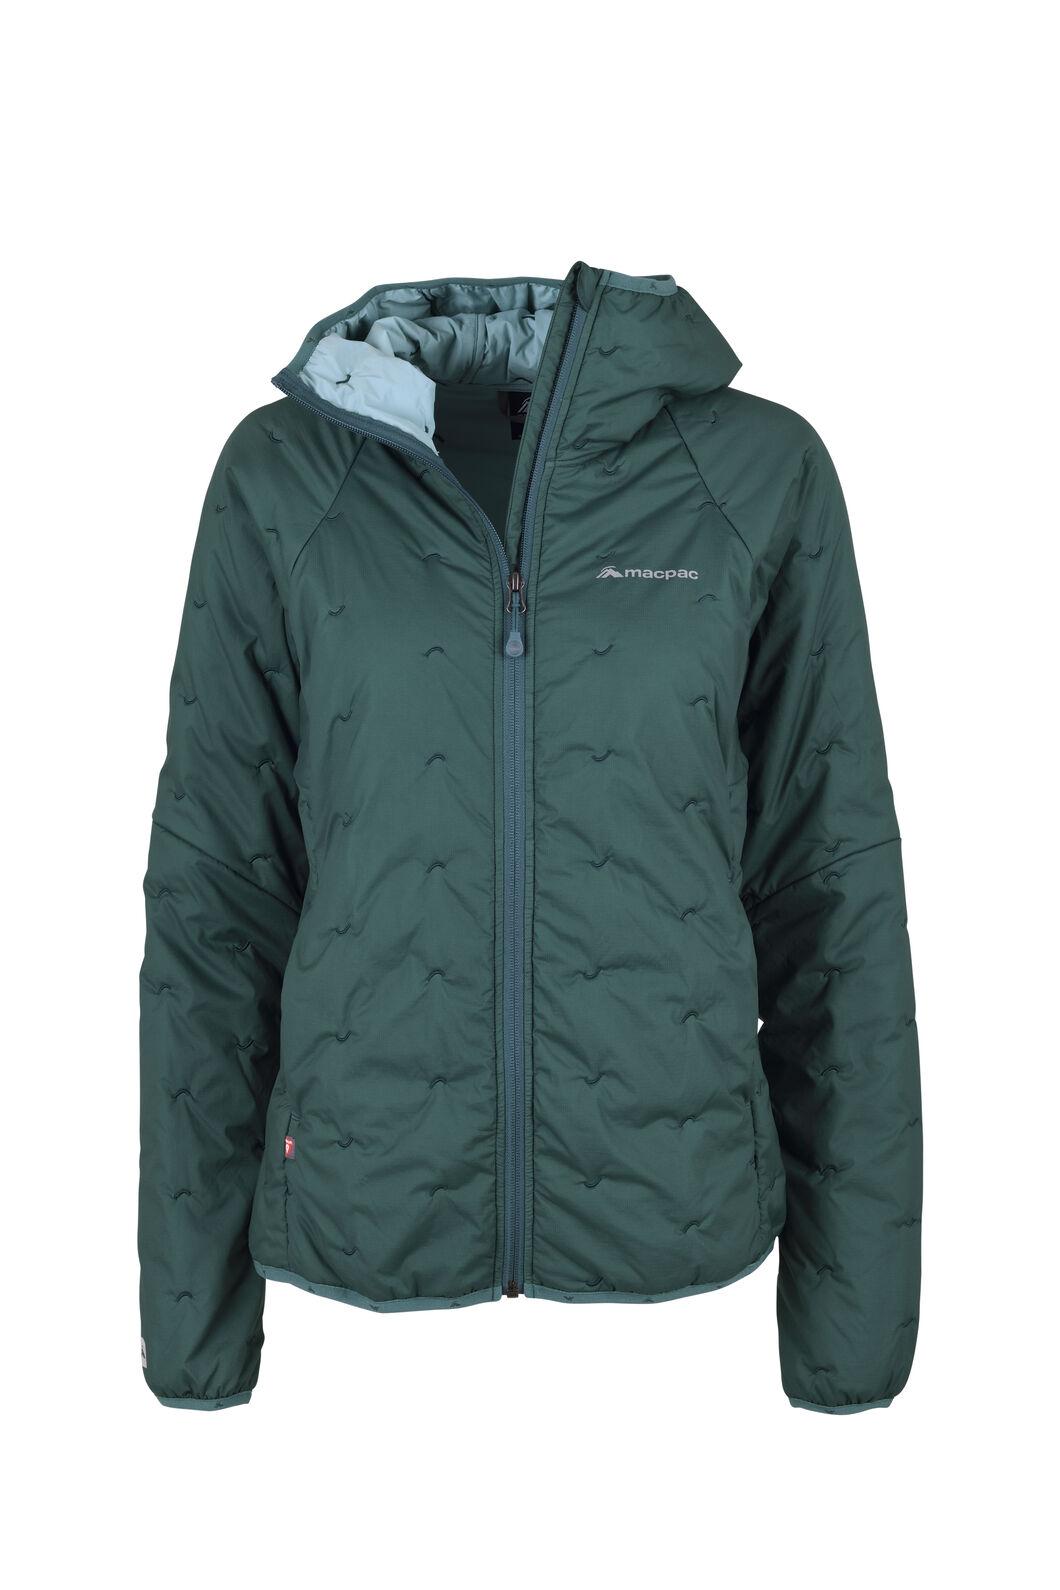 Macpac Muon PrimaLoft® Jacket - Women's, Bayberry, hi-res